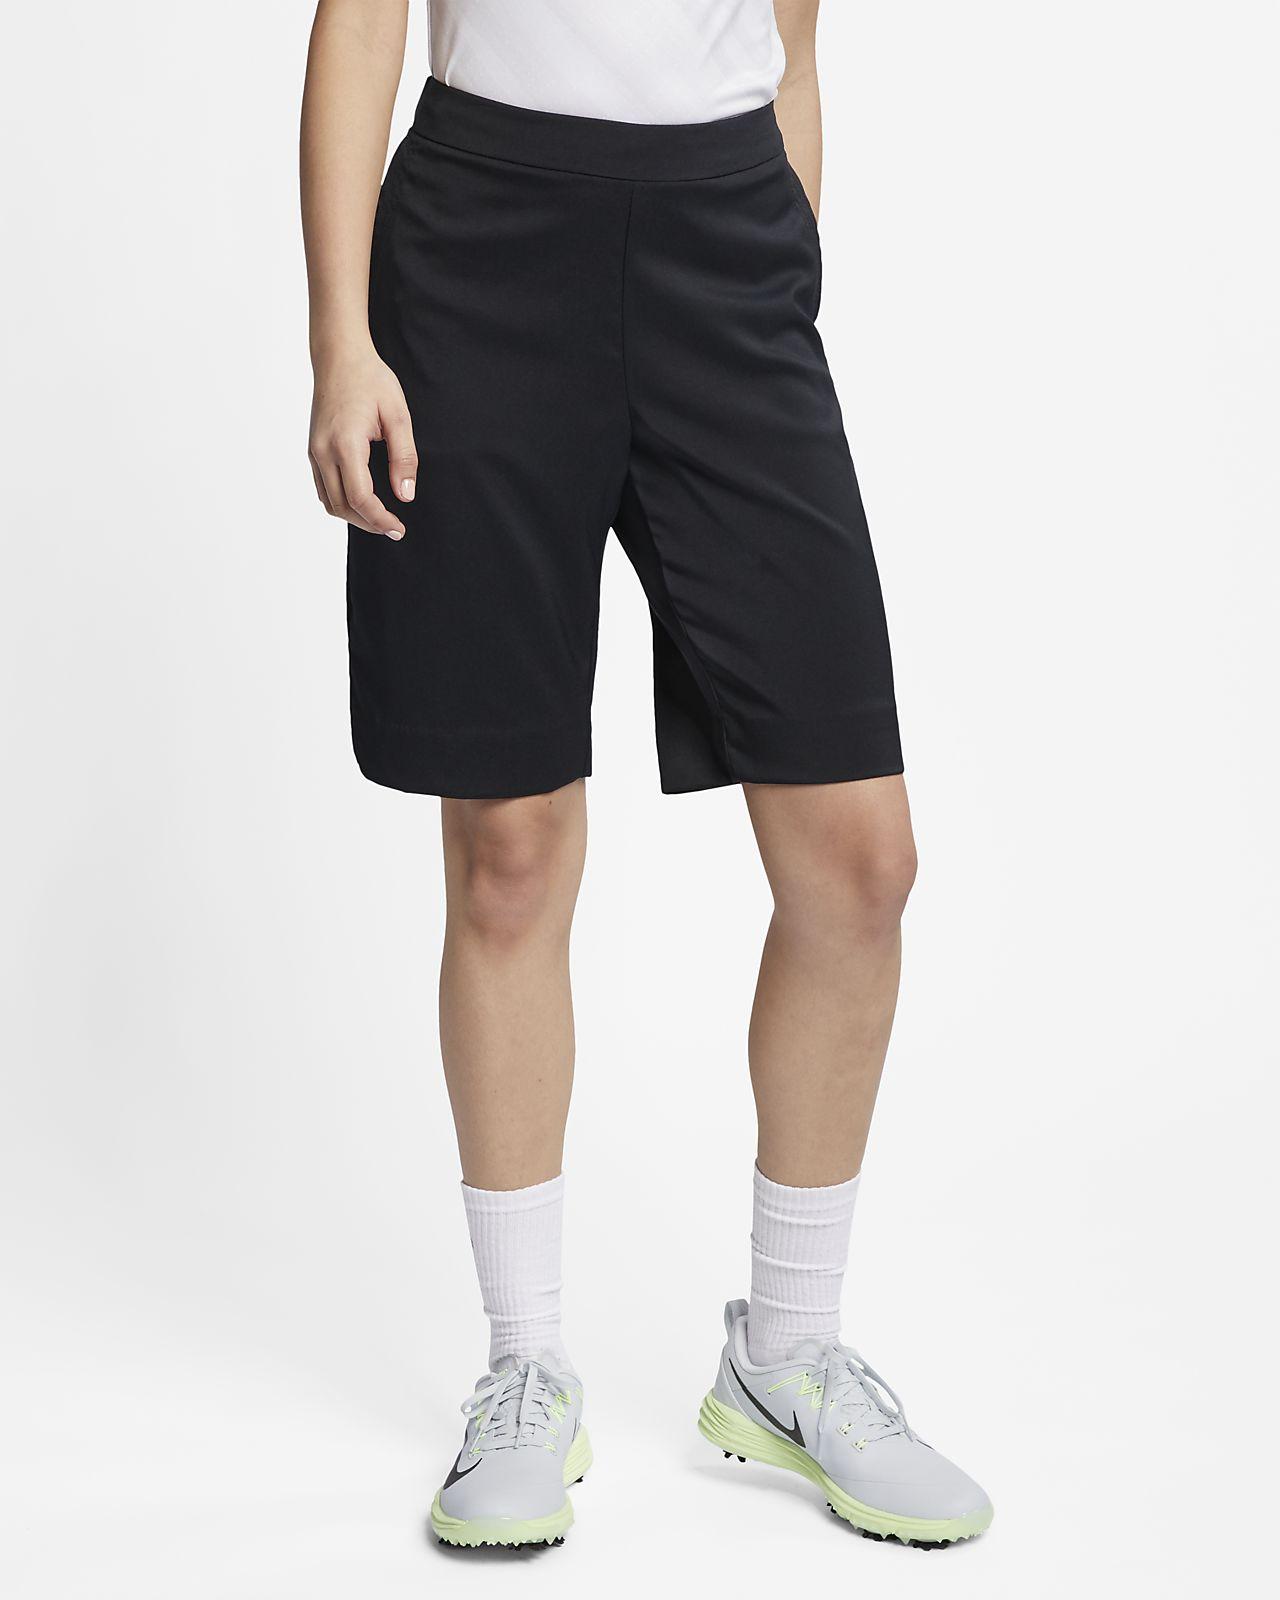 e928fc2ea9 Nike Dri-FIT UV Pantalón corto de golf de 28 cm - Mujer. Nike.com ES